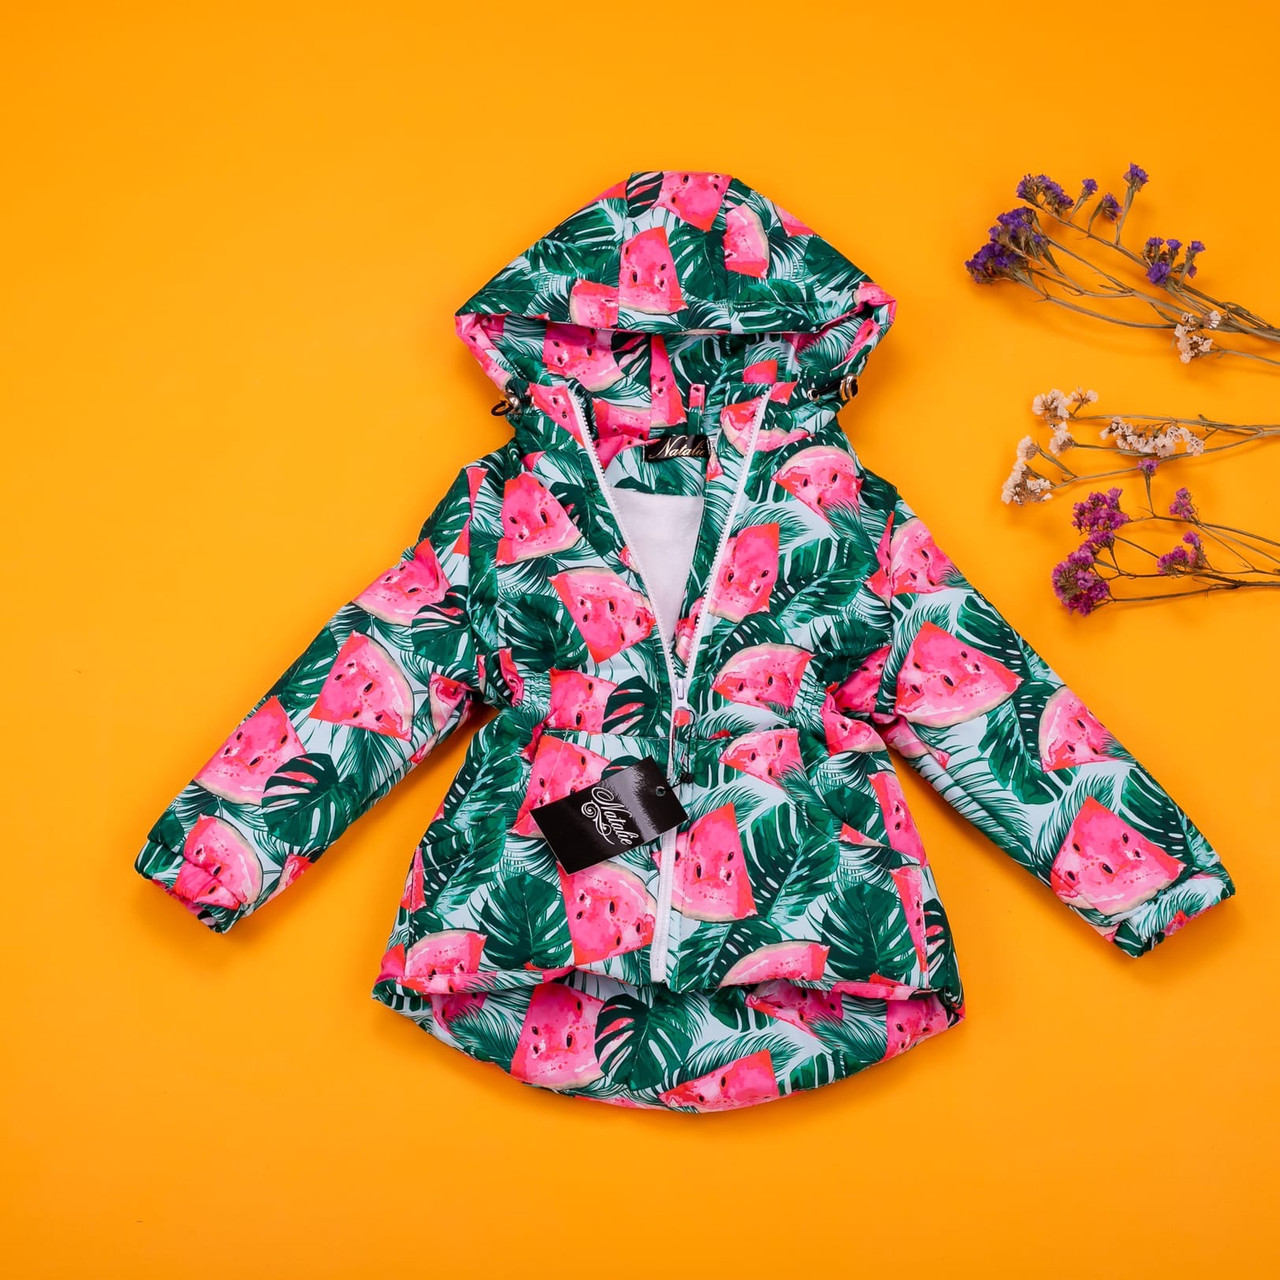 Весенняя парка куртка с принтом арбуз для девочки 80-134 р